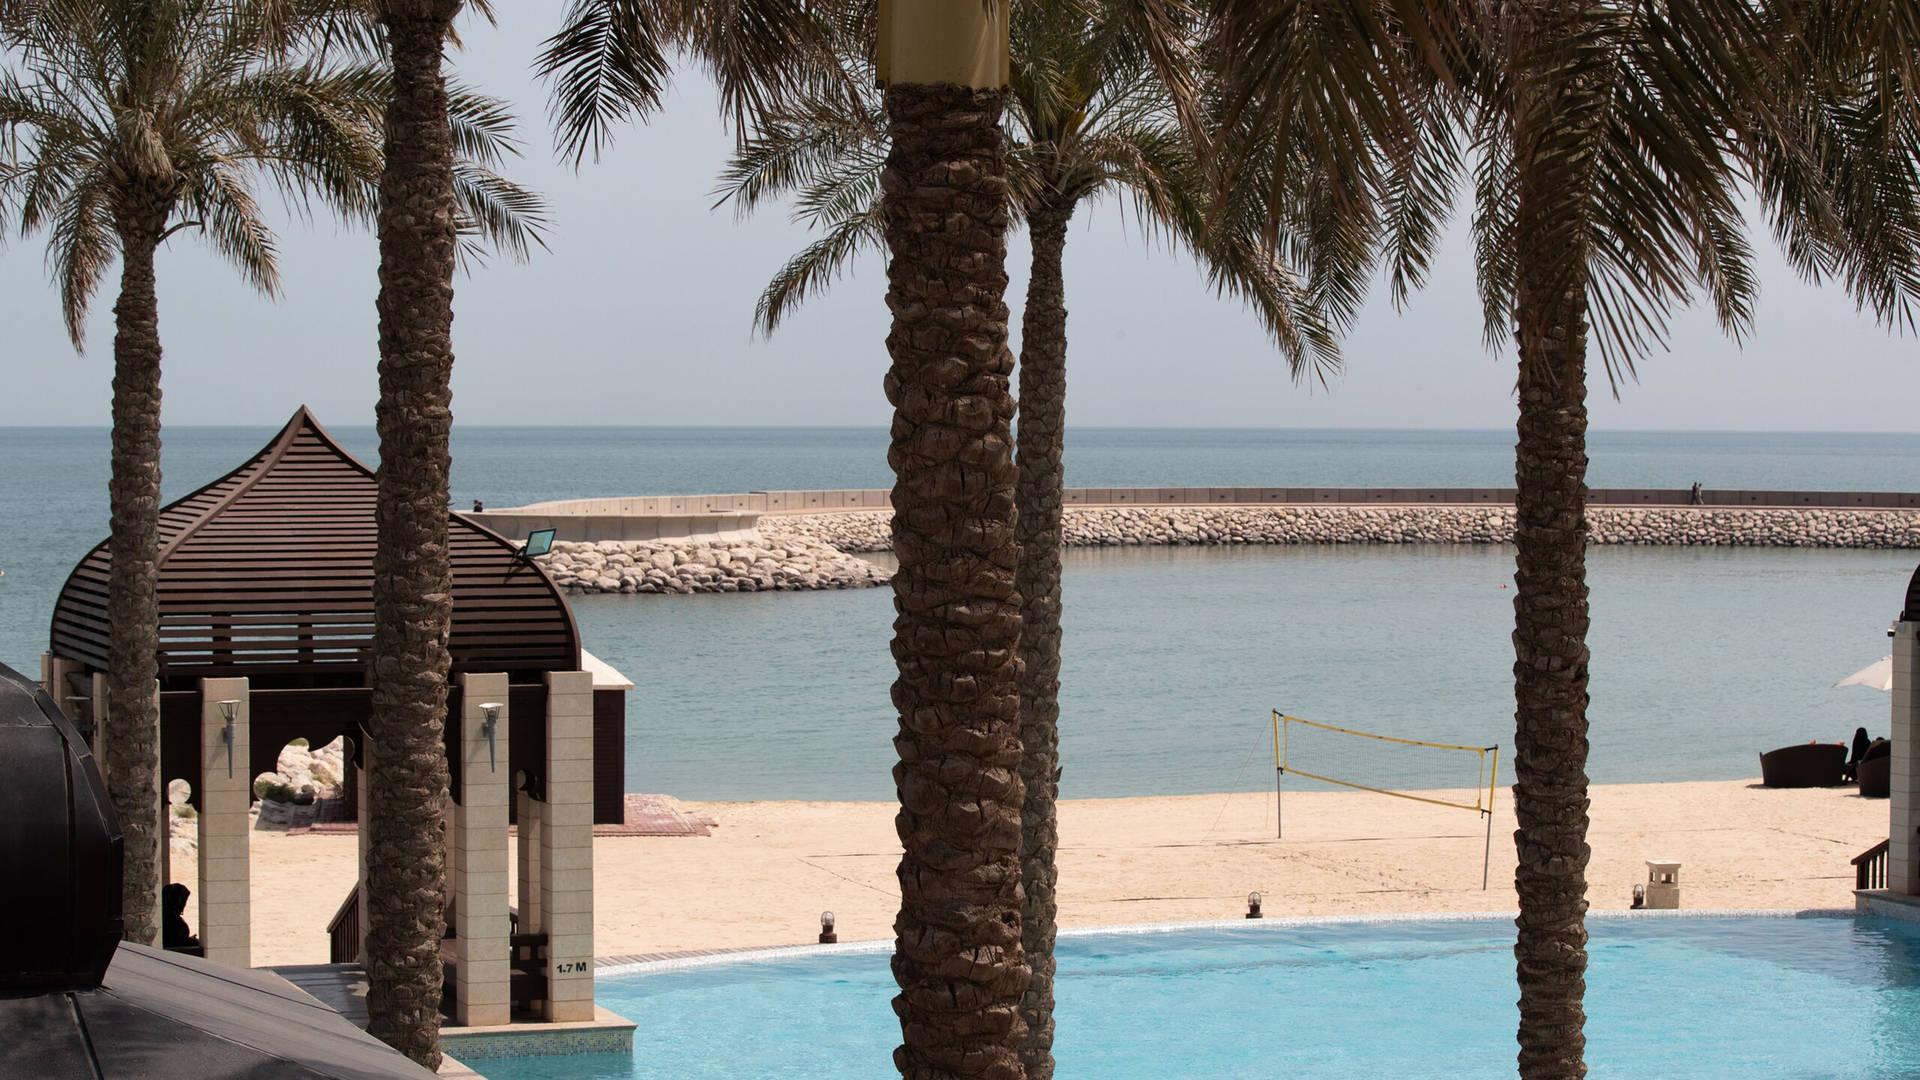 Jumeirah Messilah Beach Hotel pool